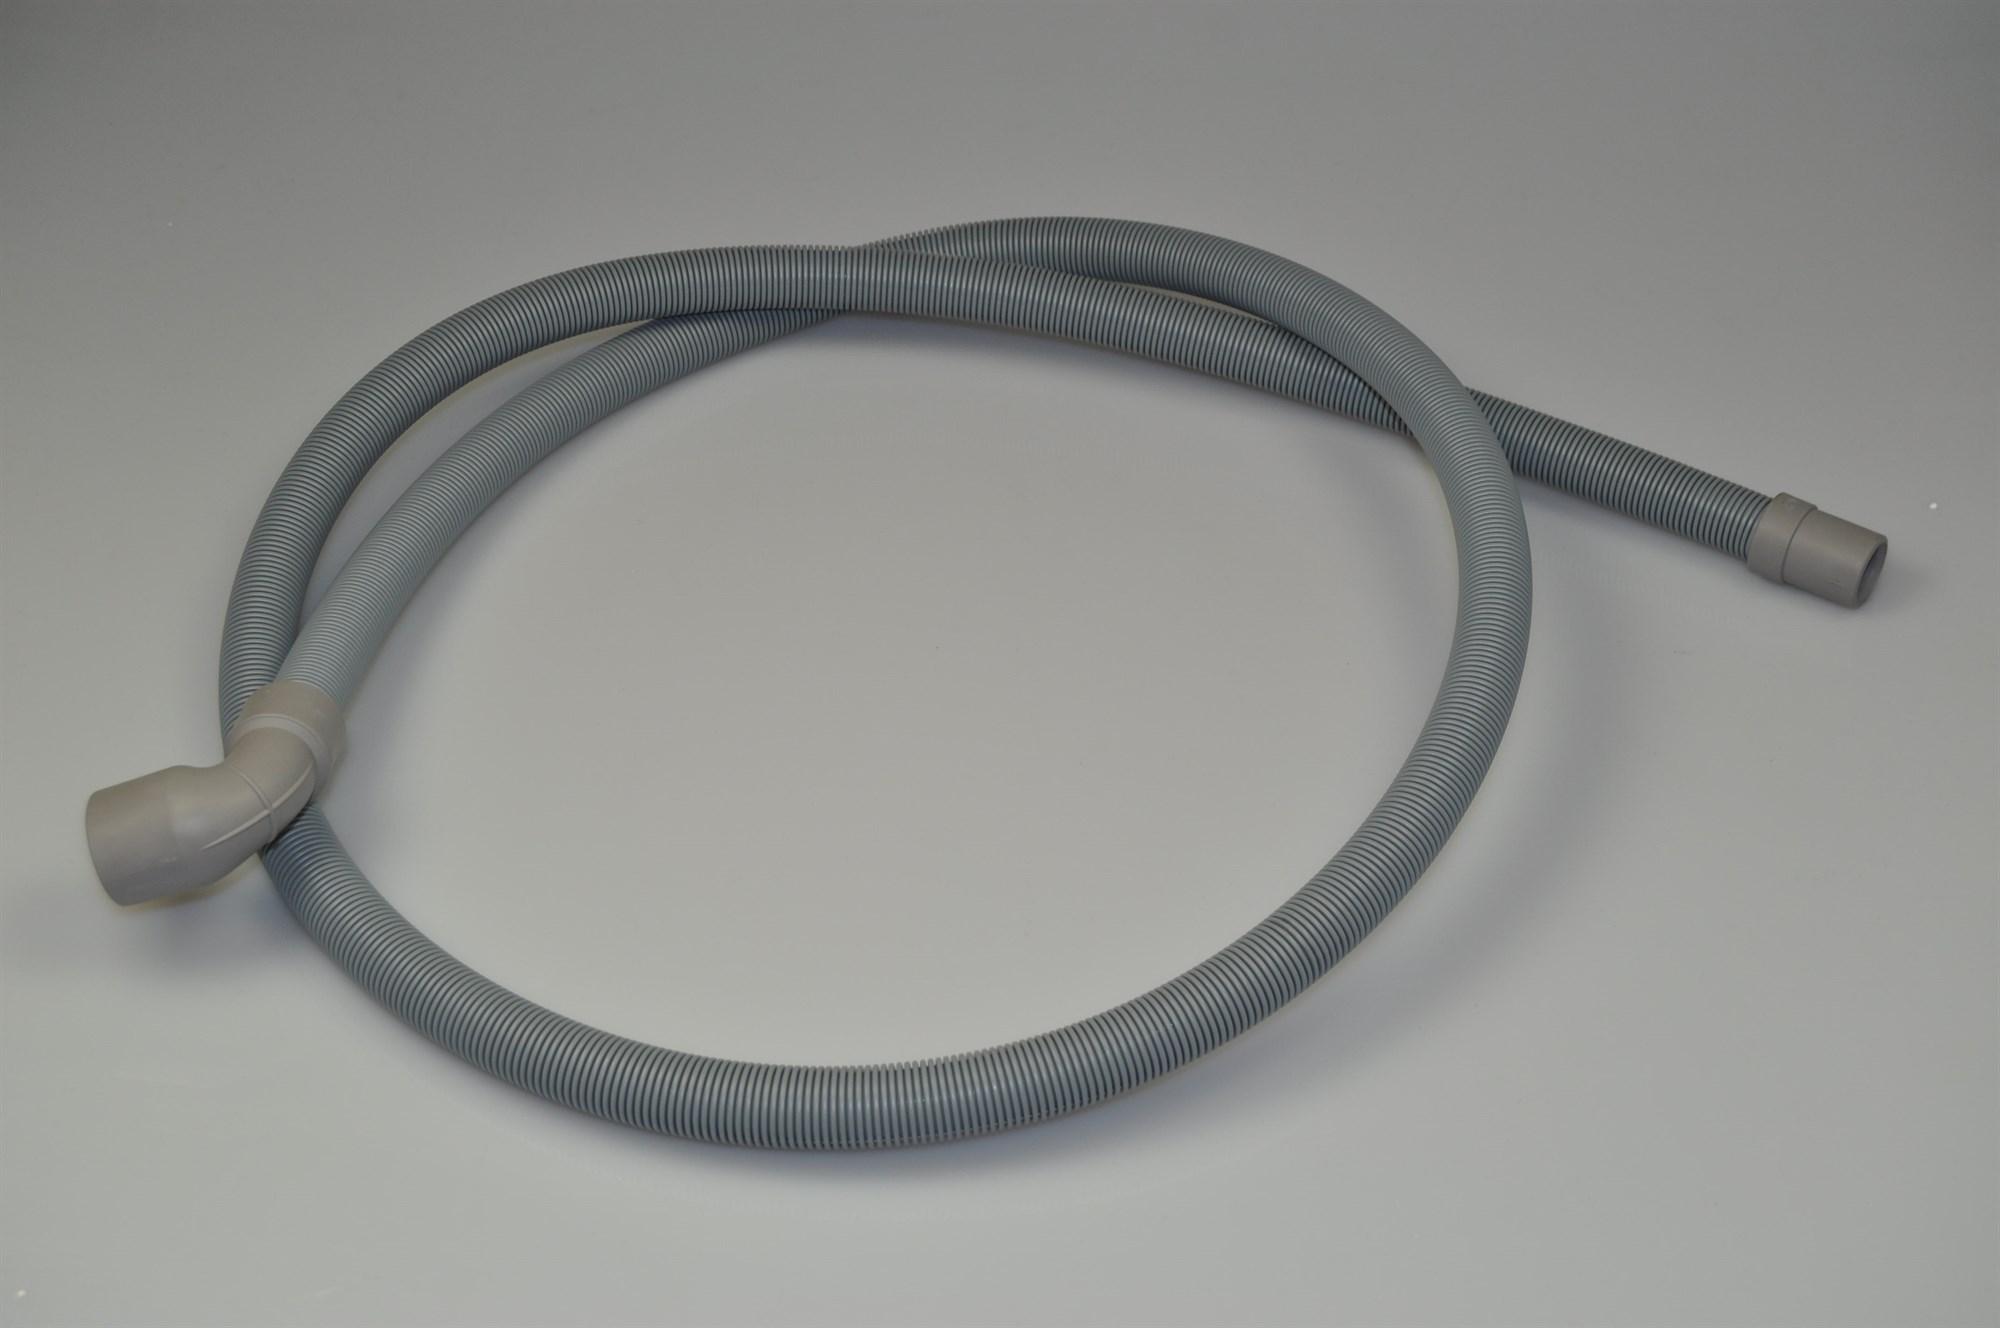 Drain Hose Whirlpool Dishwasher 2000 Mm